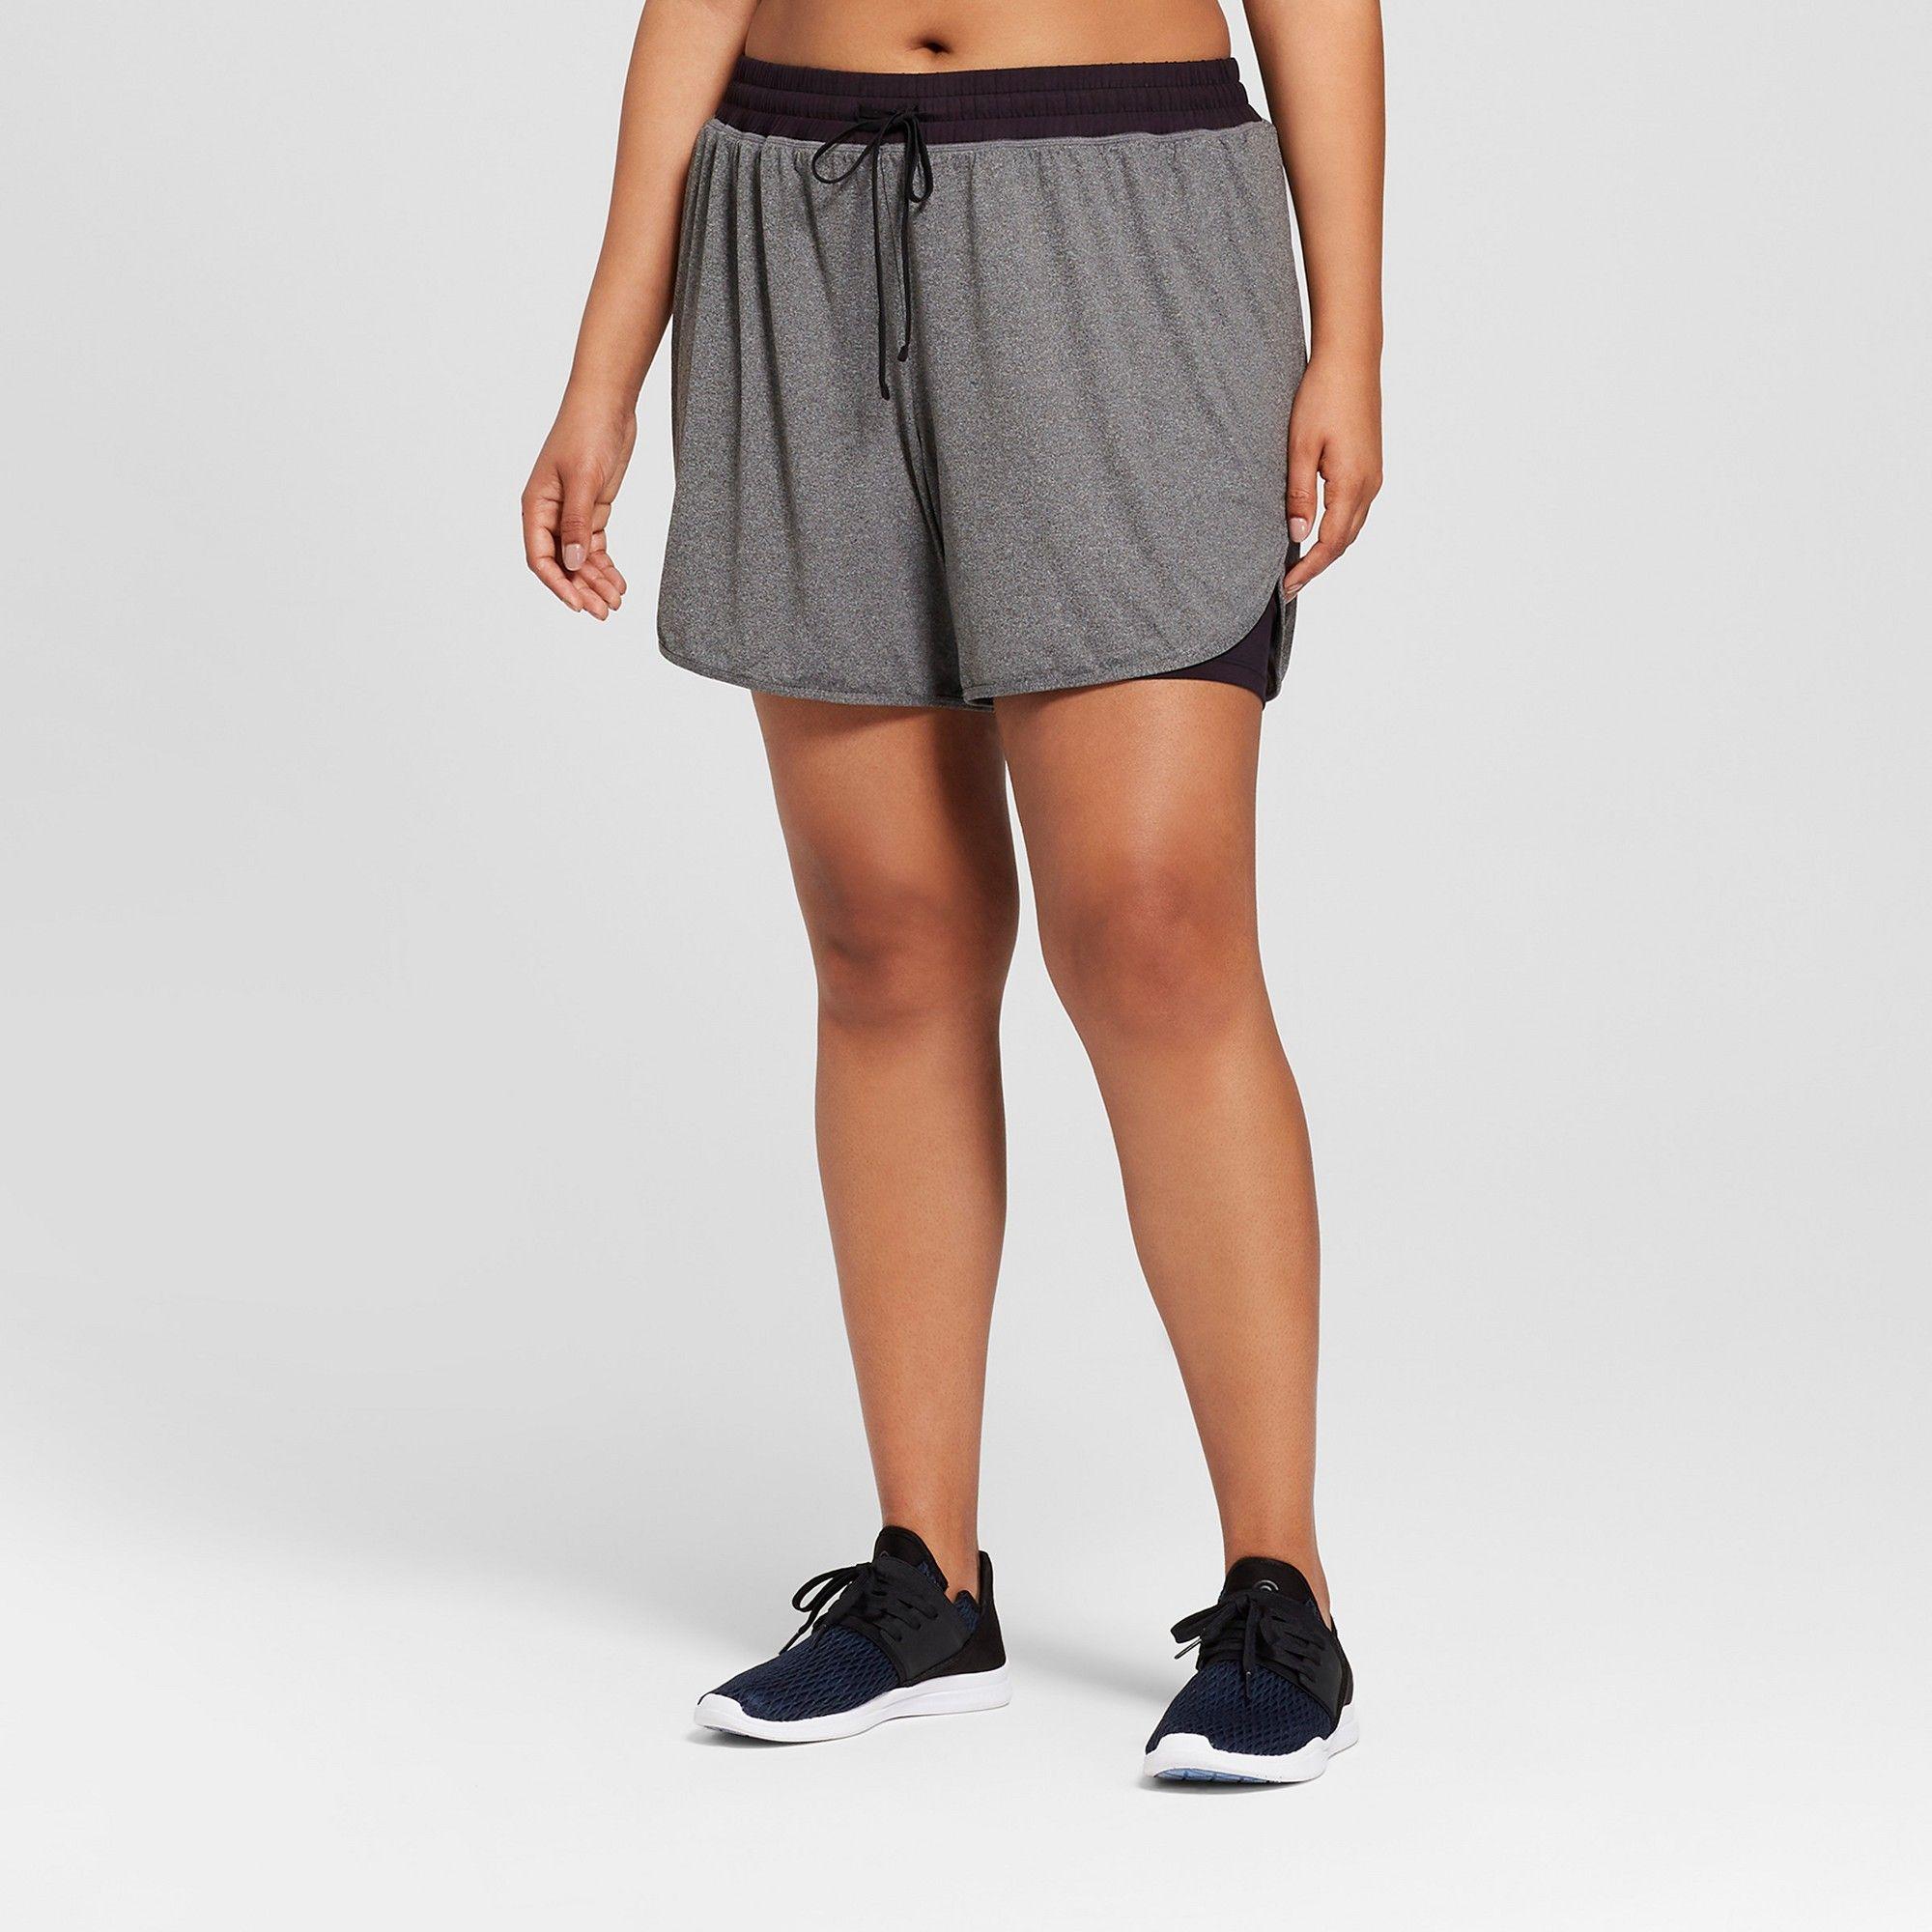 ca39005840fa Women s Plus Size Knit Layered Shorts - C9 Champion Dark Heather Gray 1X